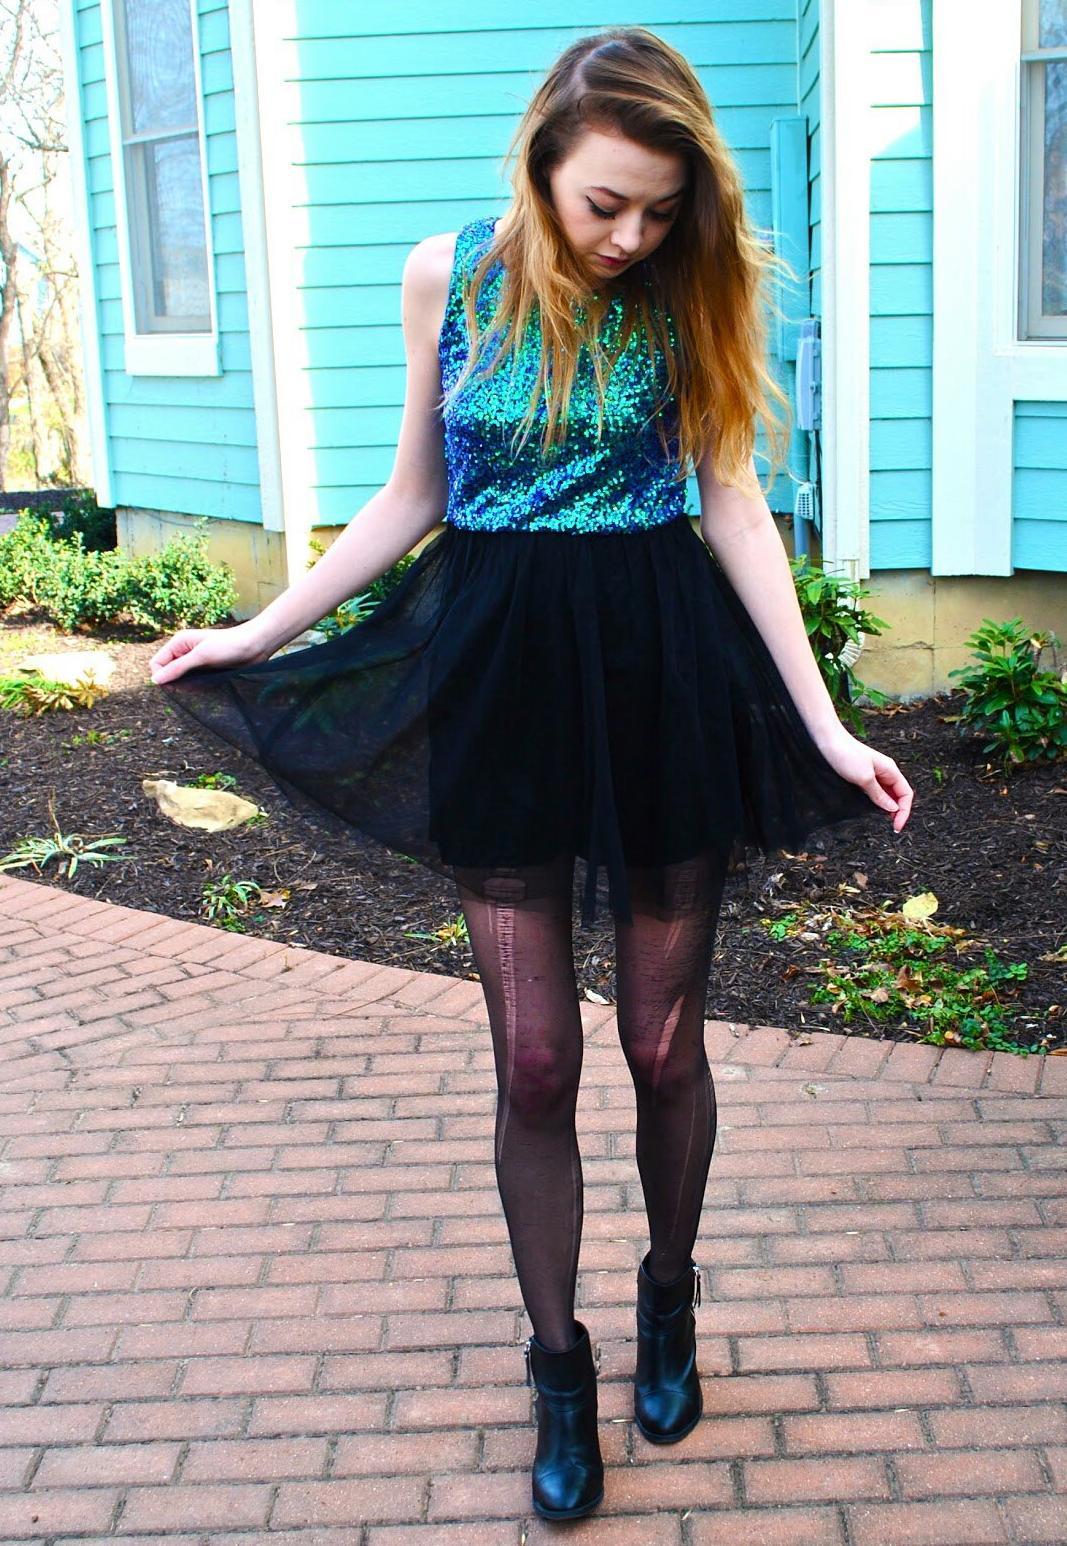 Auburn Girl wearing Black See Through Shirt and Black